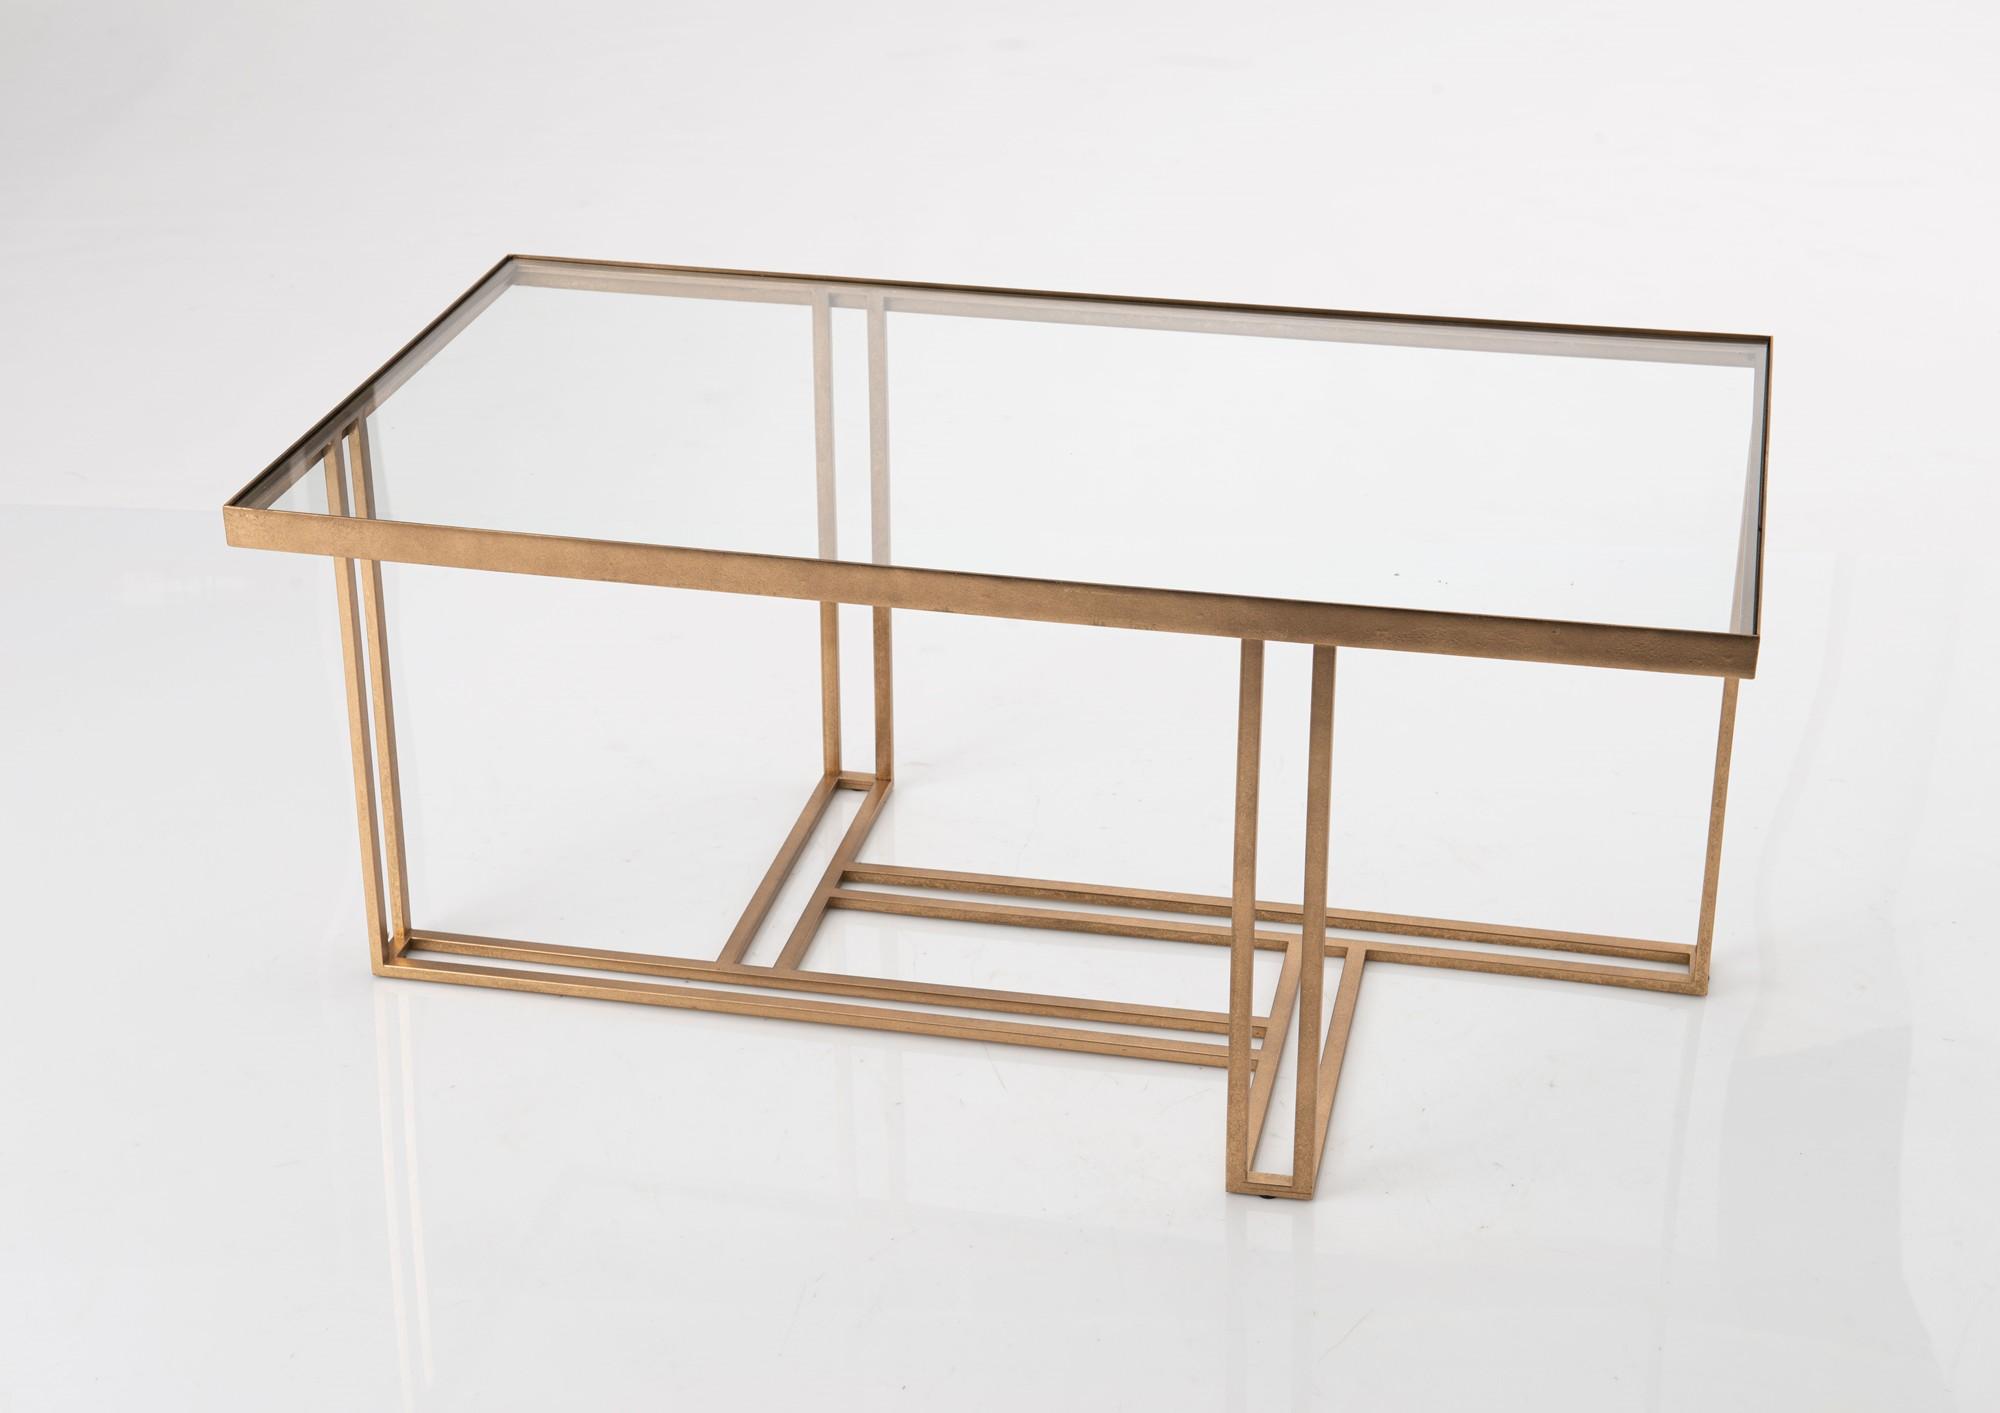 table basse luxe en metal dore et plateau en verre